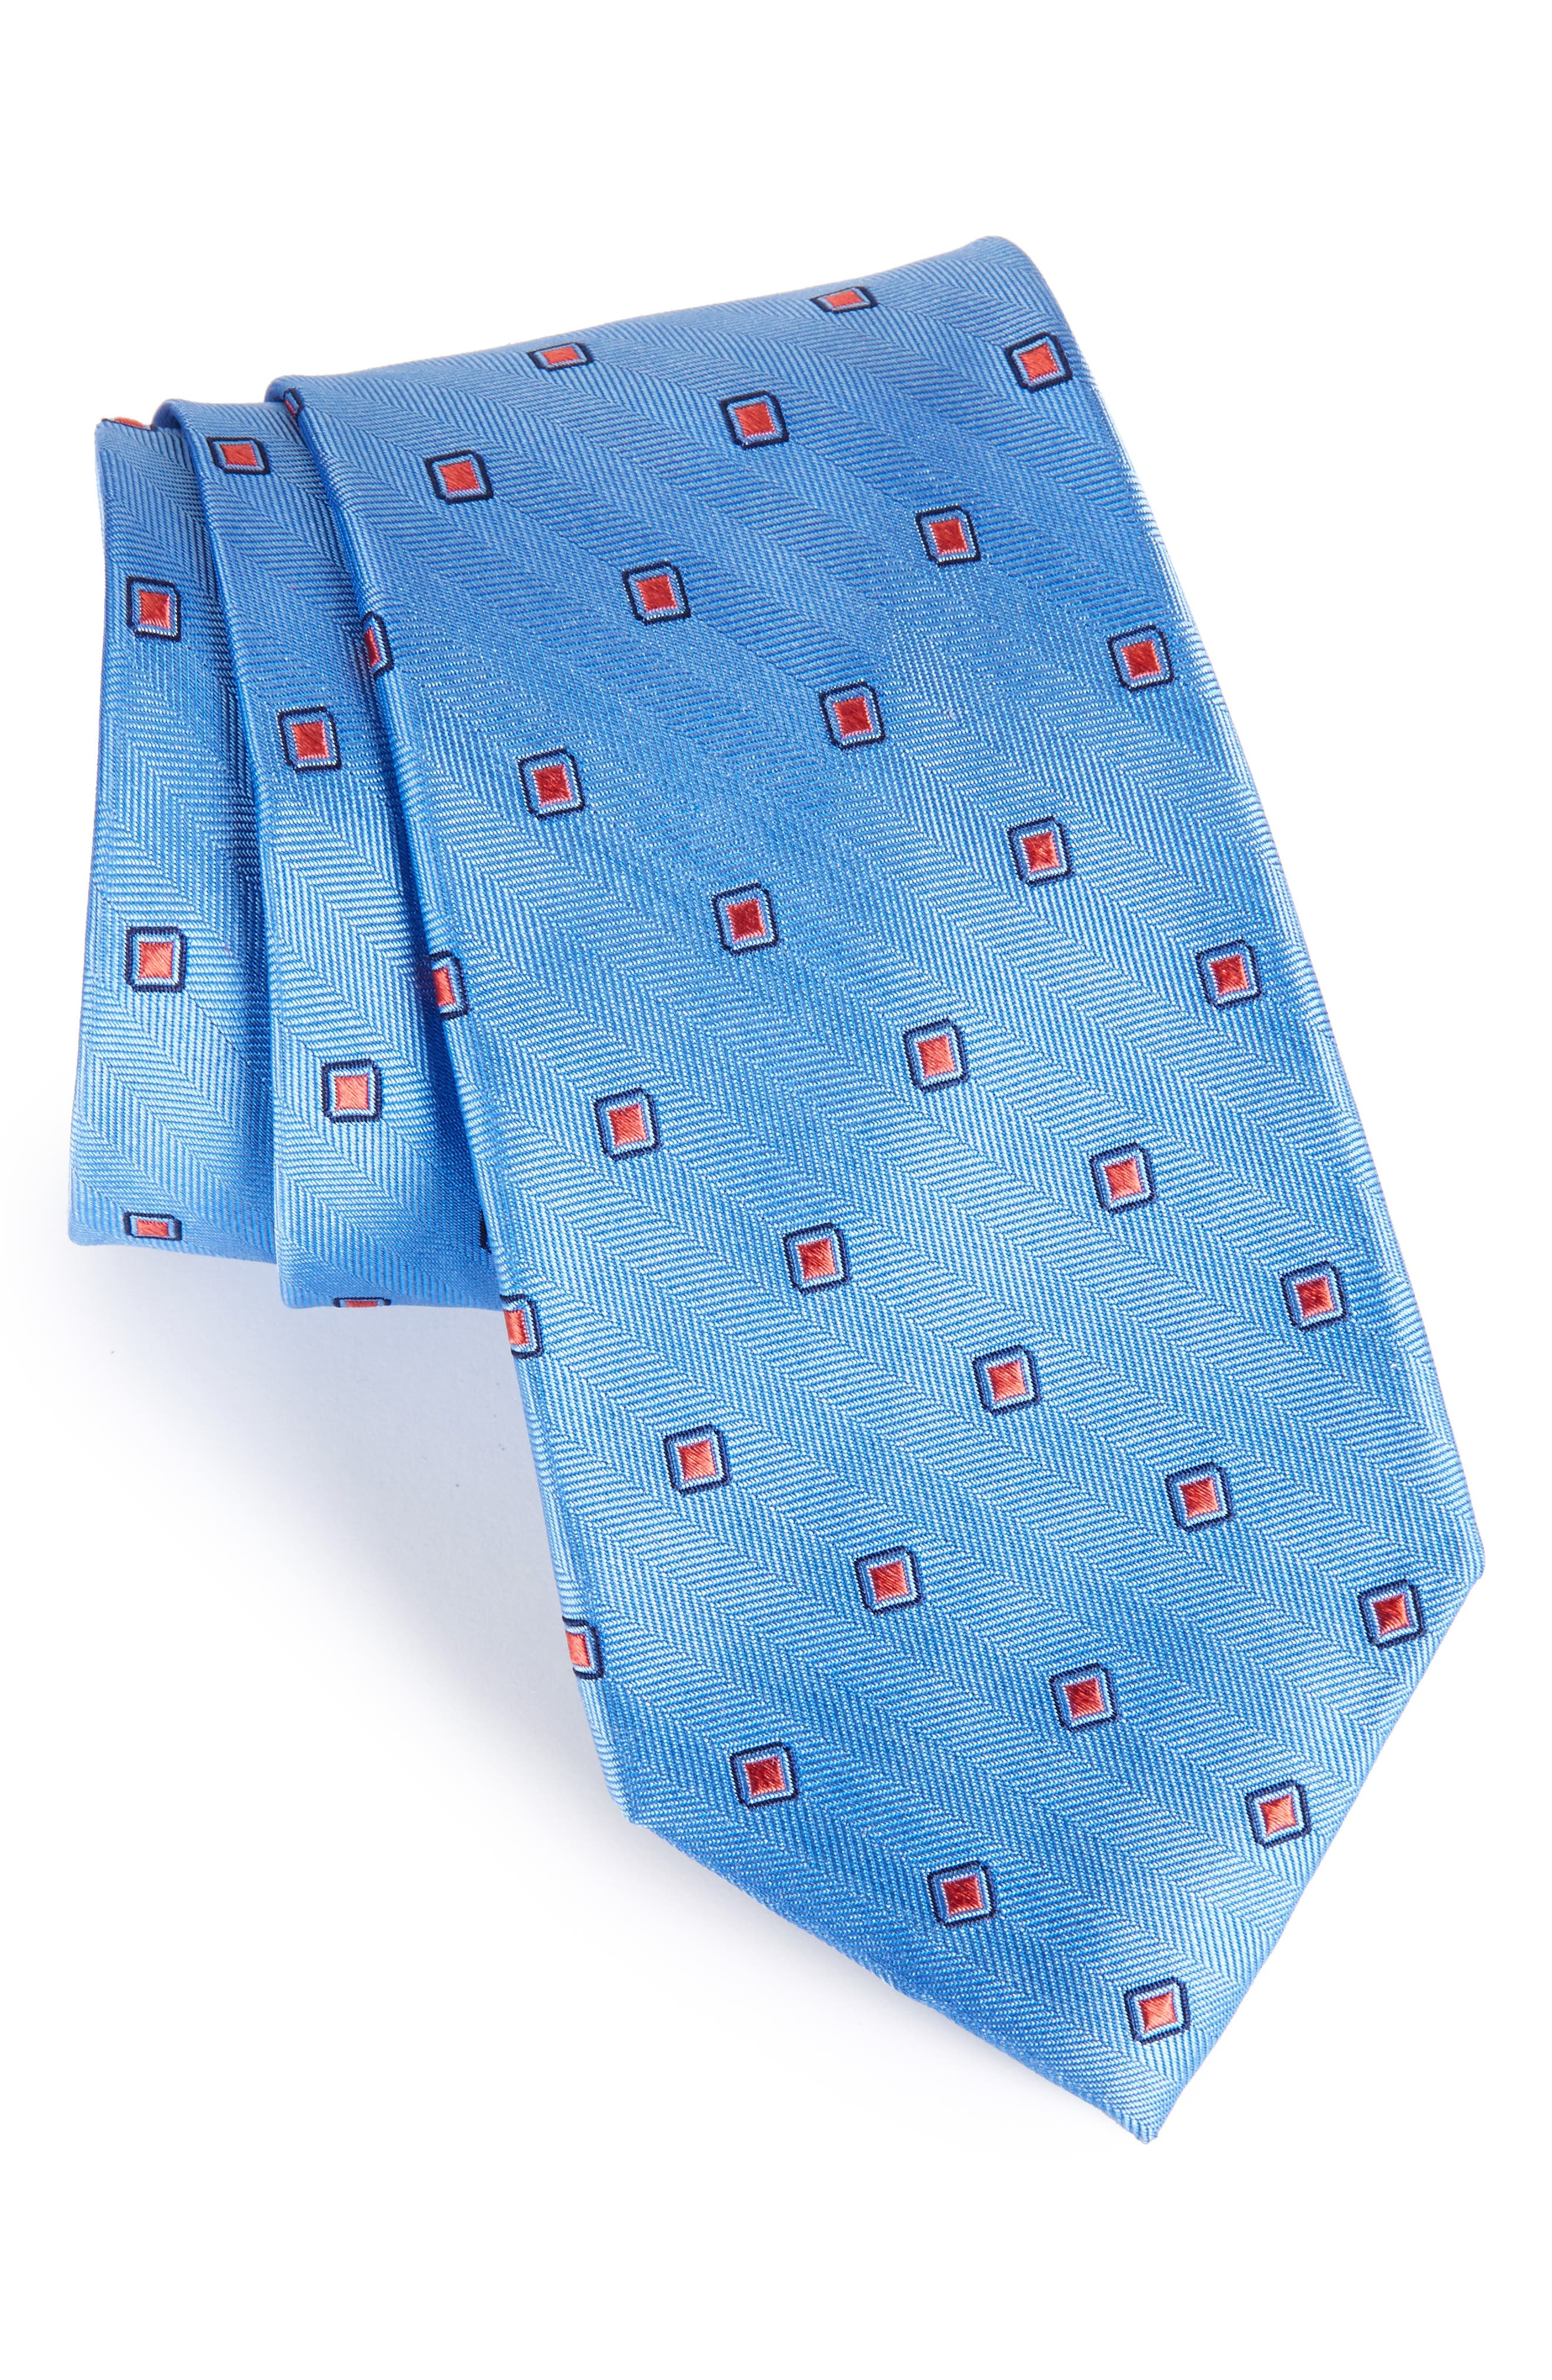 Nordstrom Men's Shop Open Ground Silk Tie